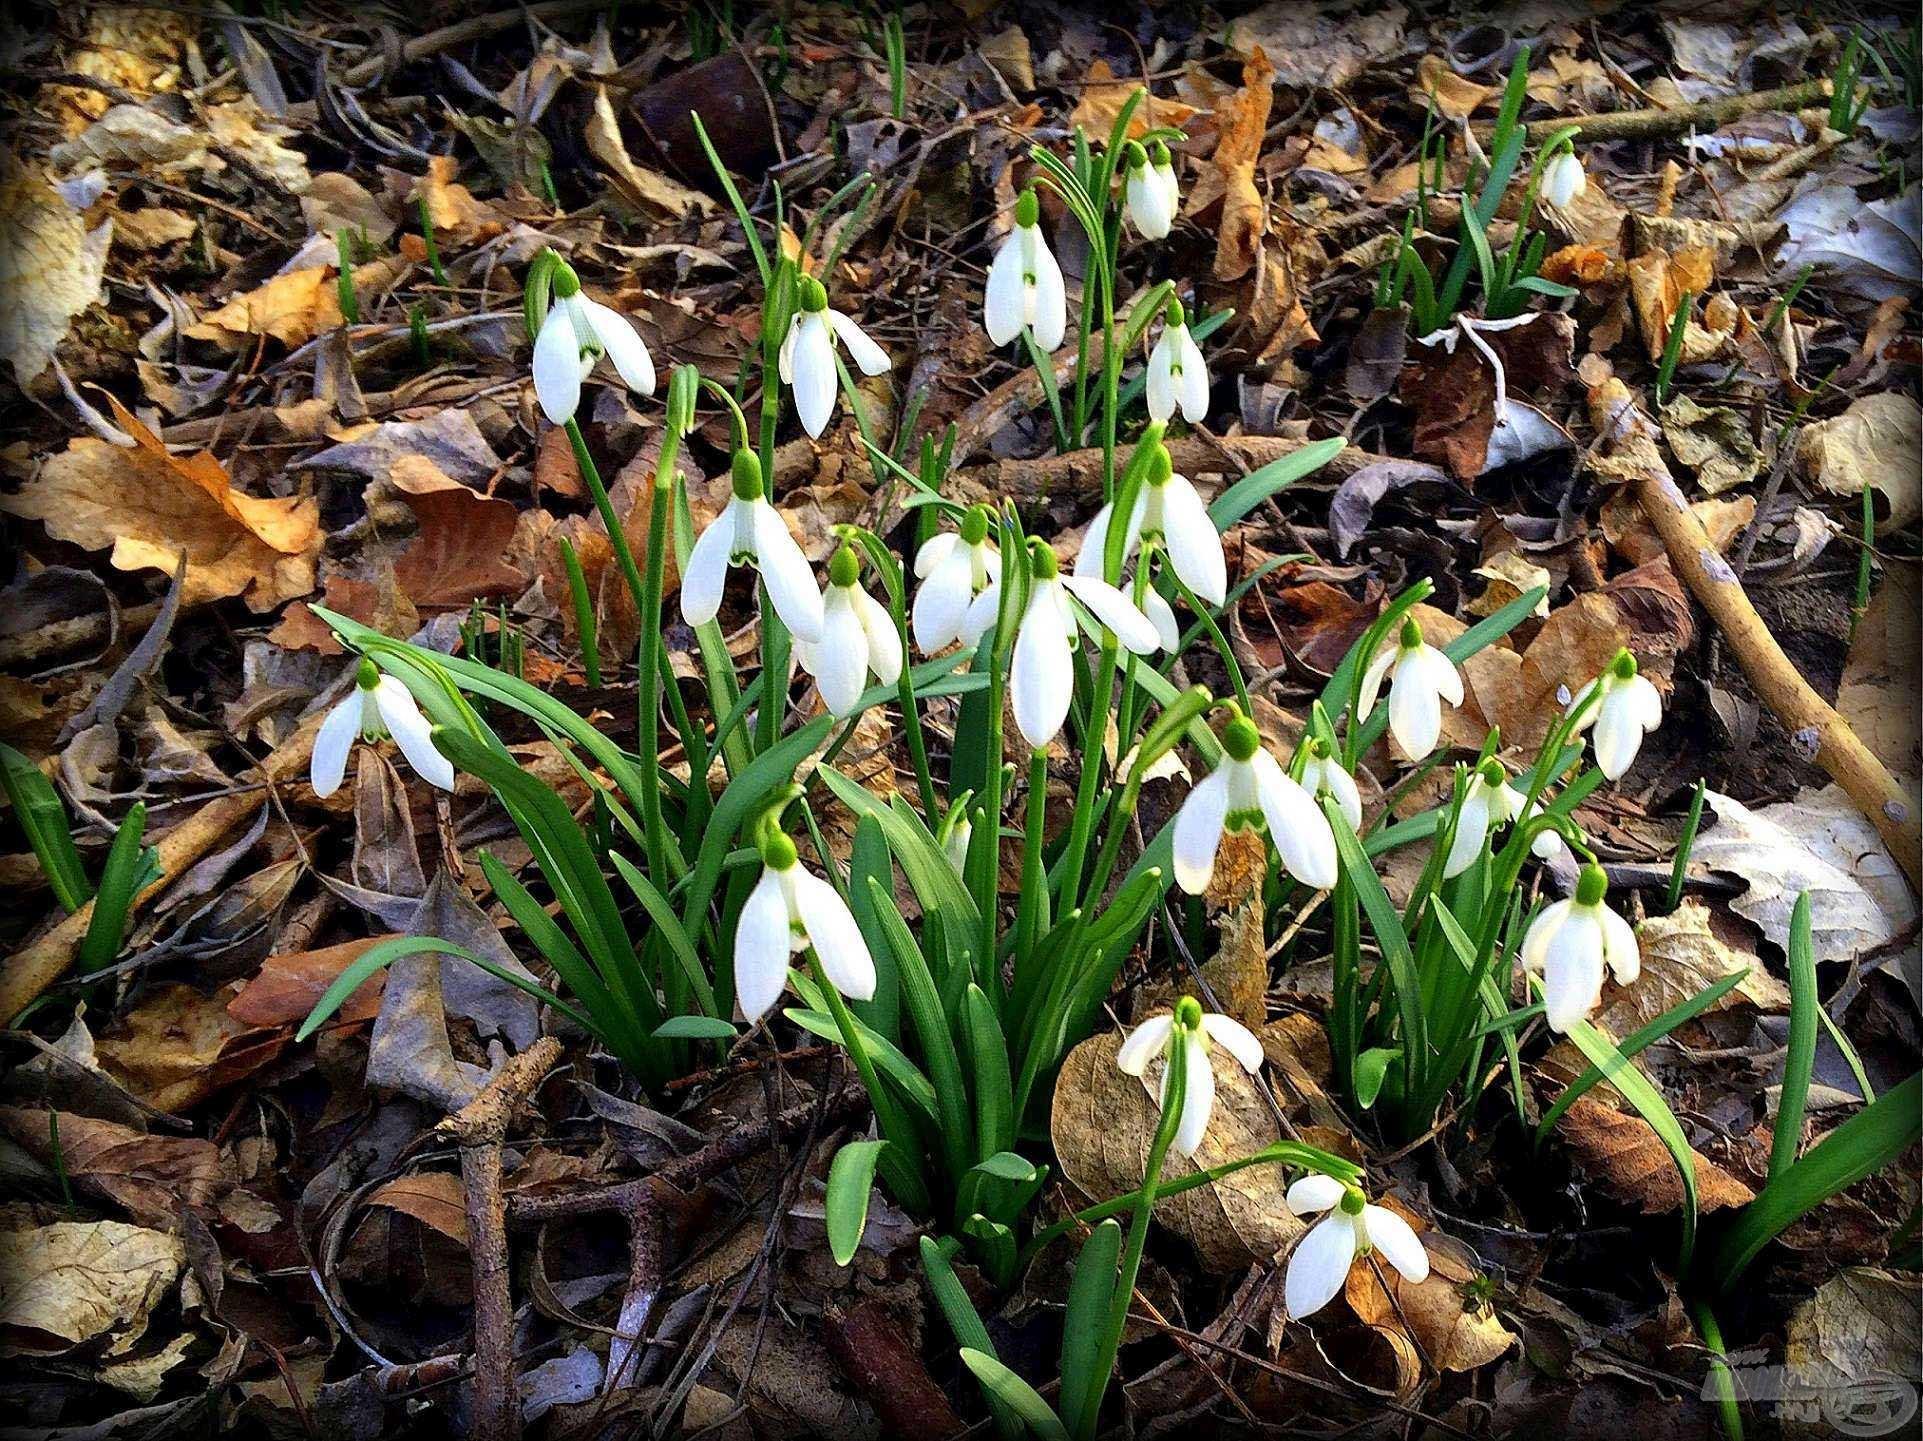 Kora tavaszi csoda – hóvirág